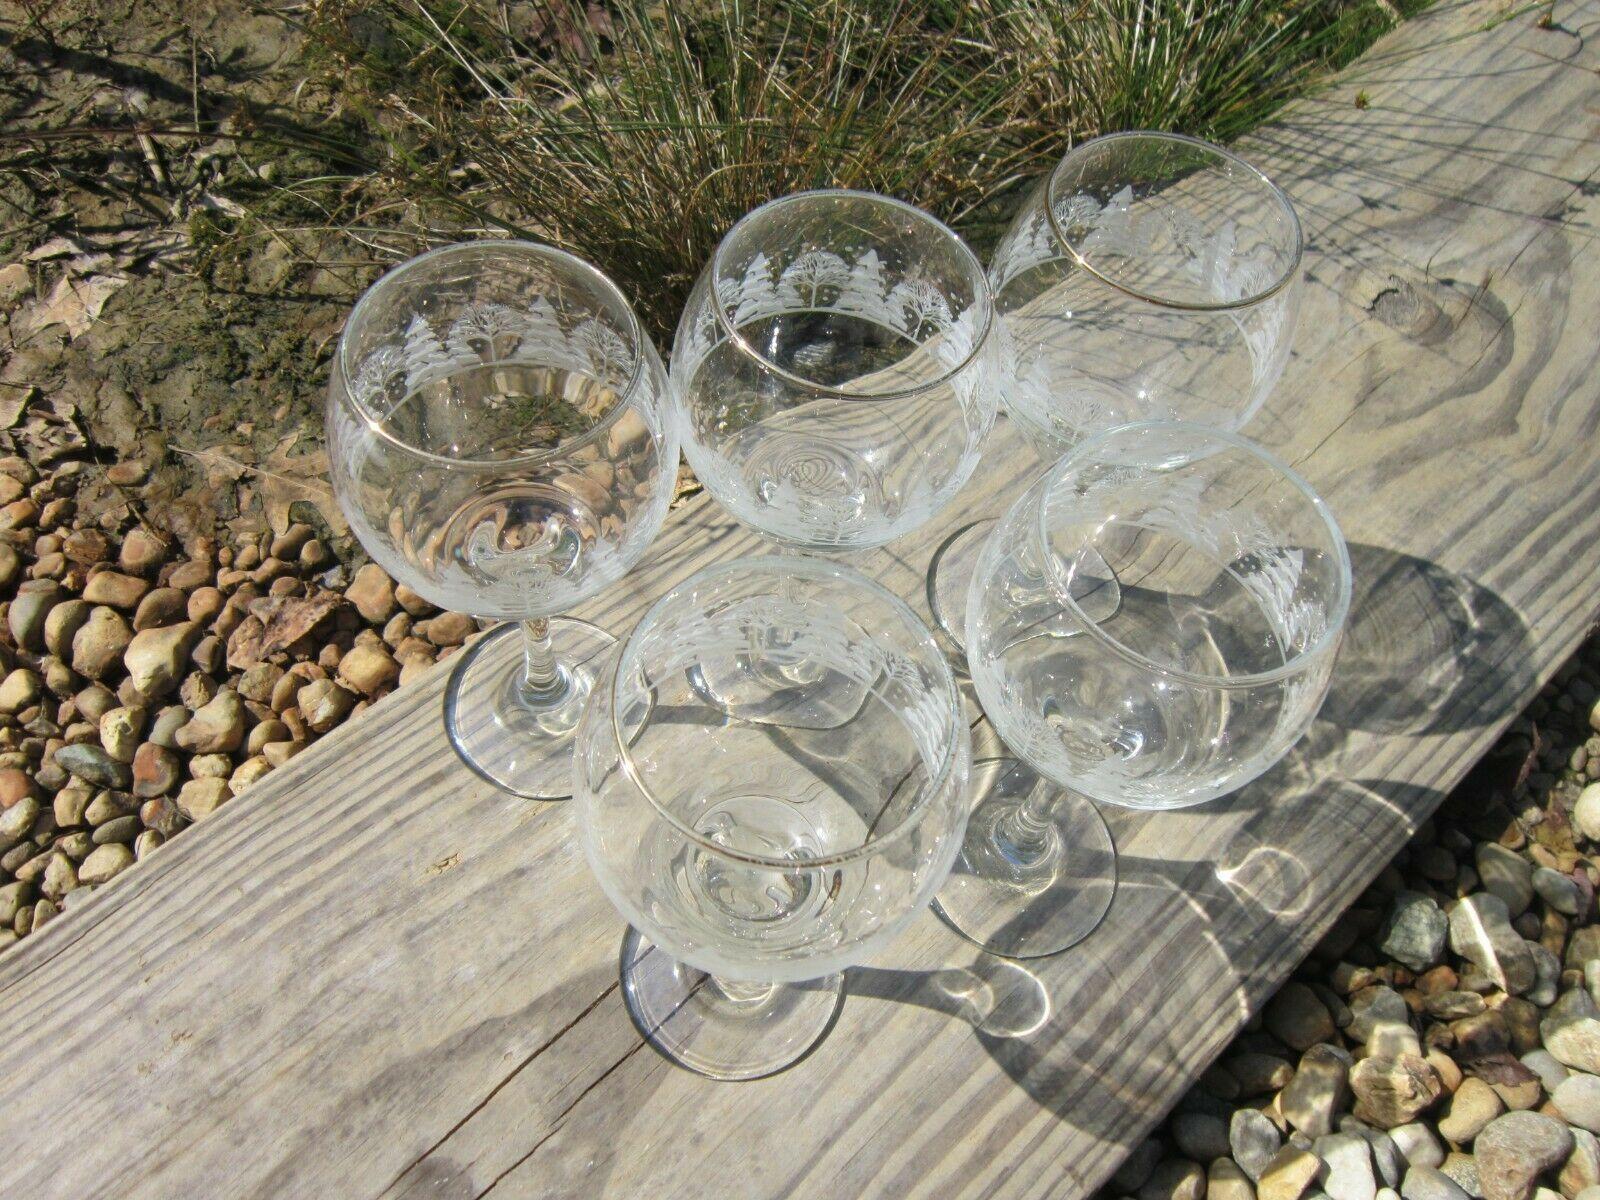 Arby's Winter Goblets, Set of 5 Vintage 1980s Wine Glasses image 3